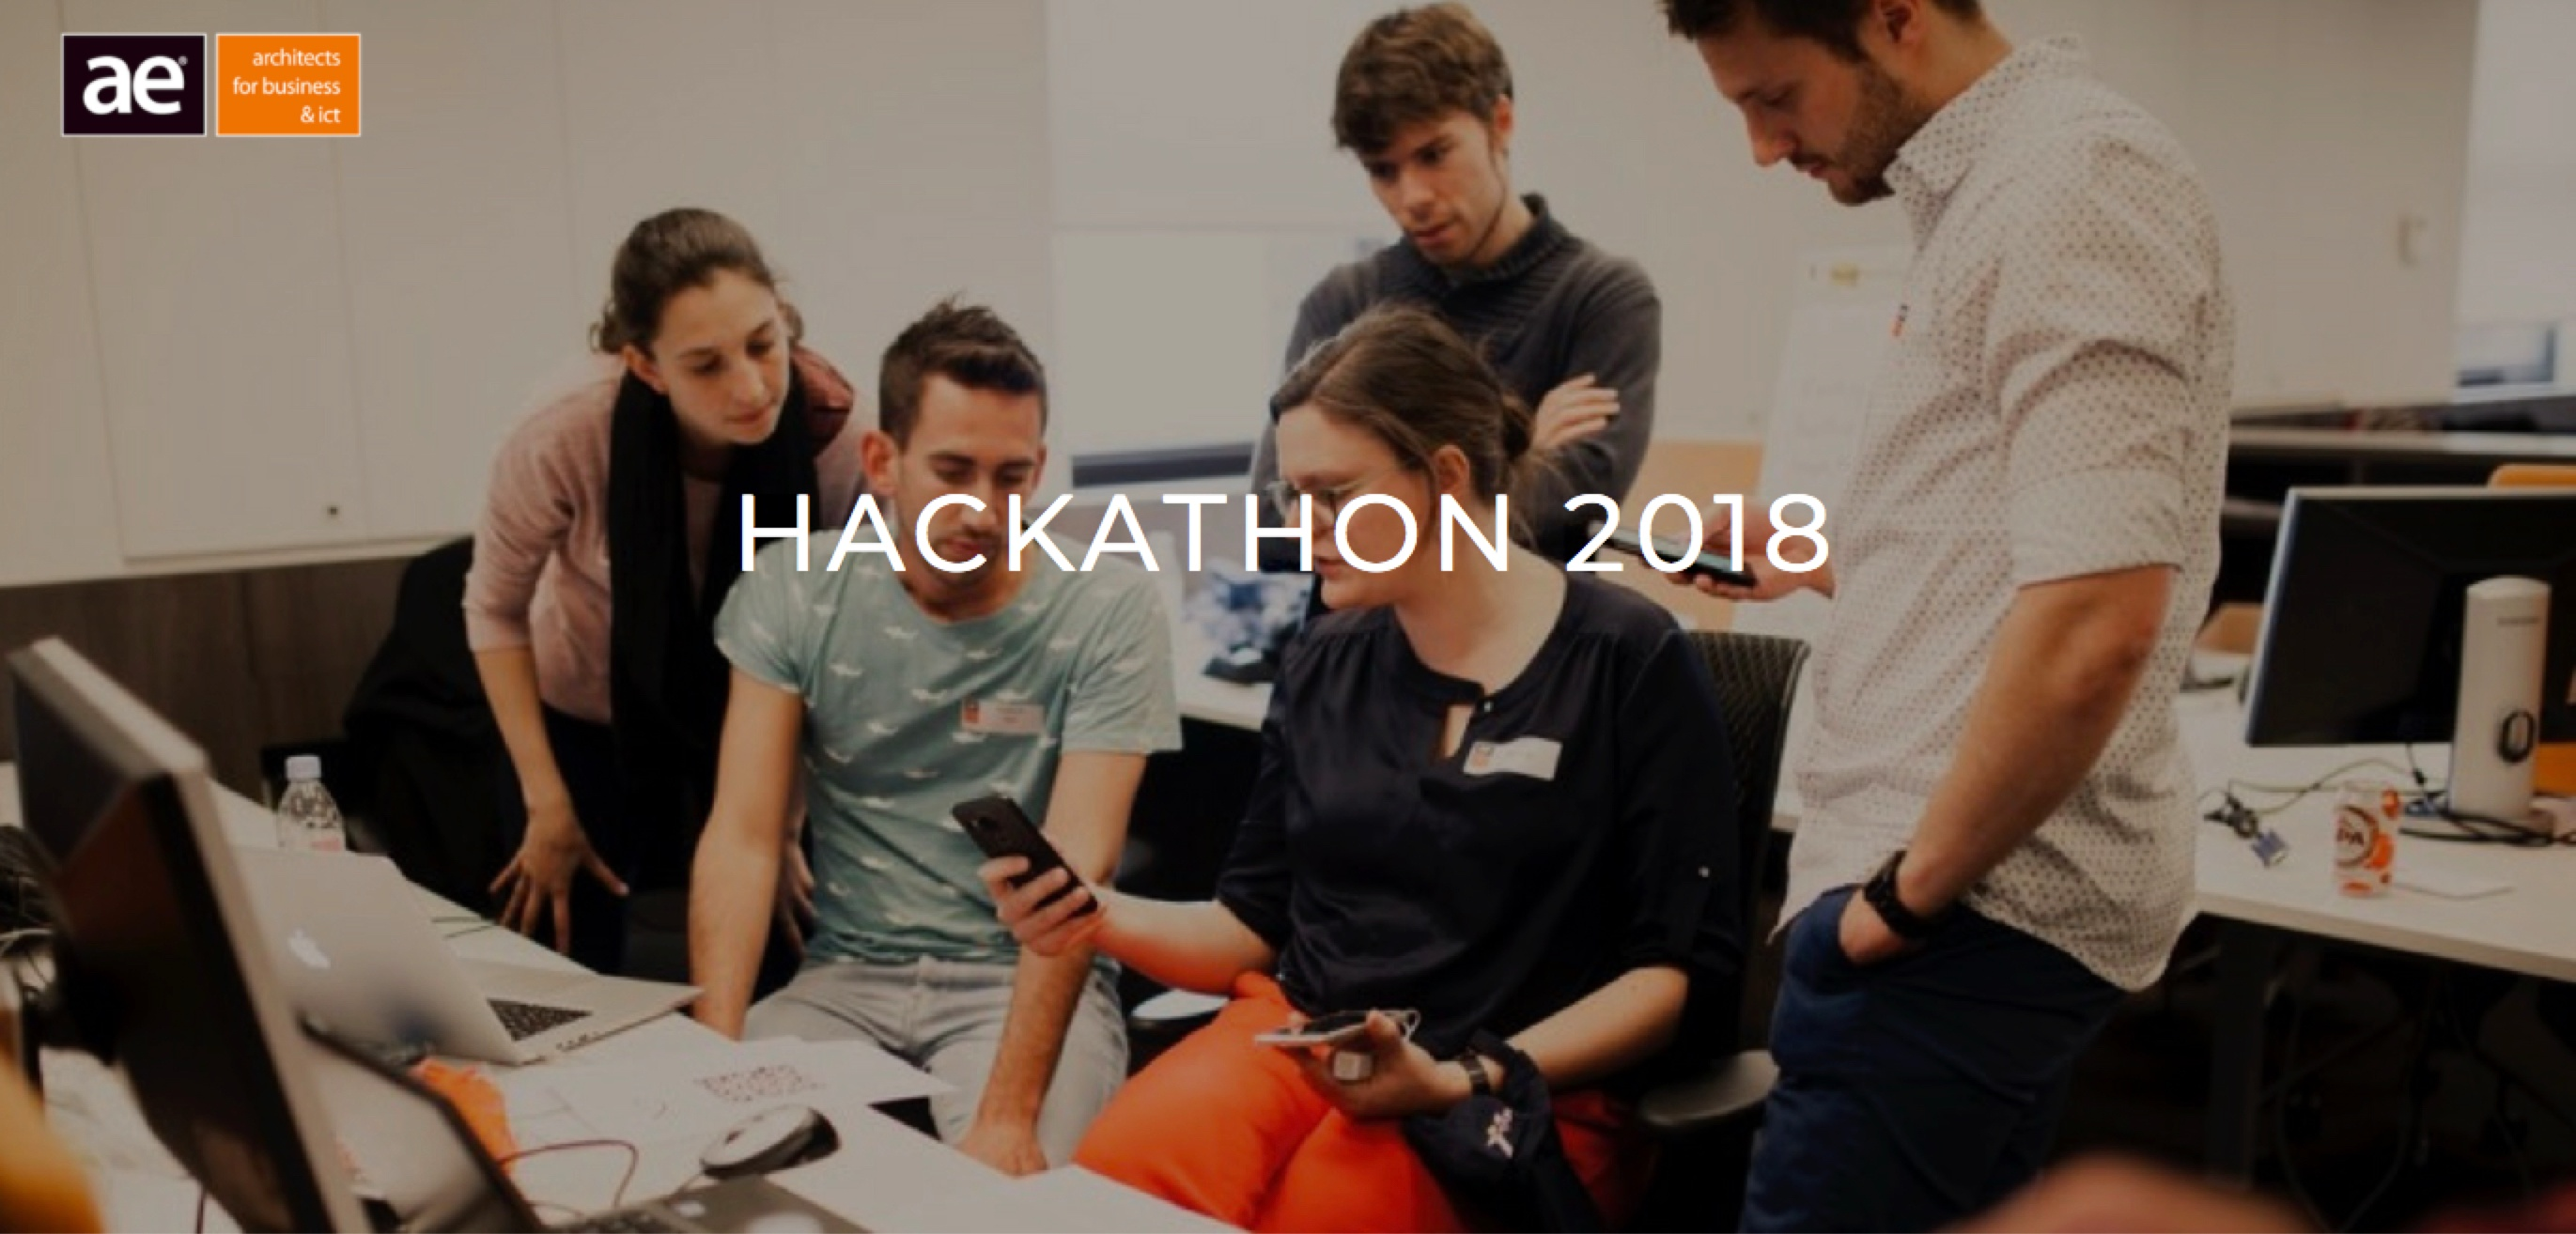 AE Hackathon 2018